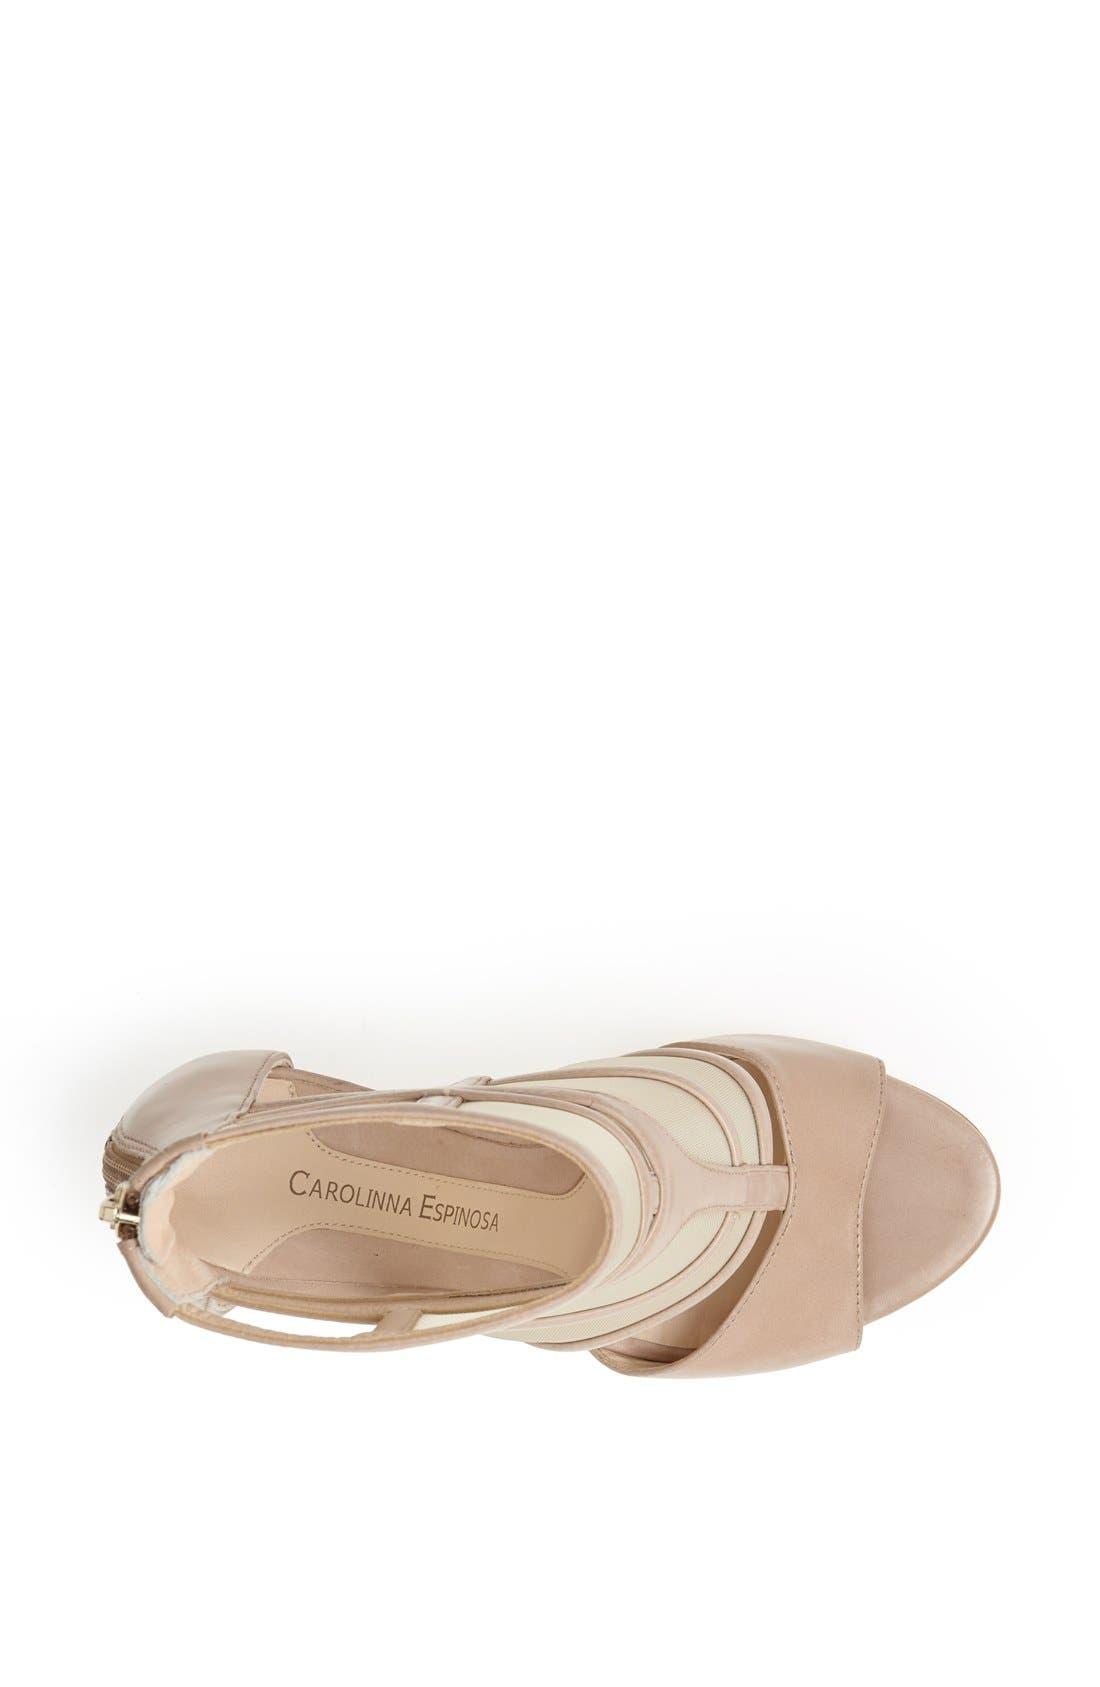 Alternate Image 3  - Carolinna Espinosa 'Sammy' Leather Sandal